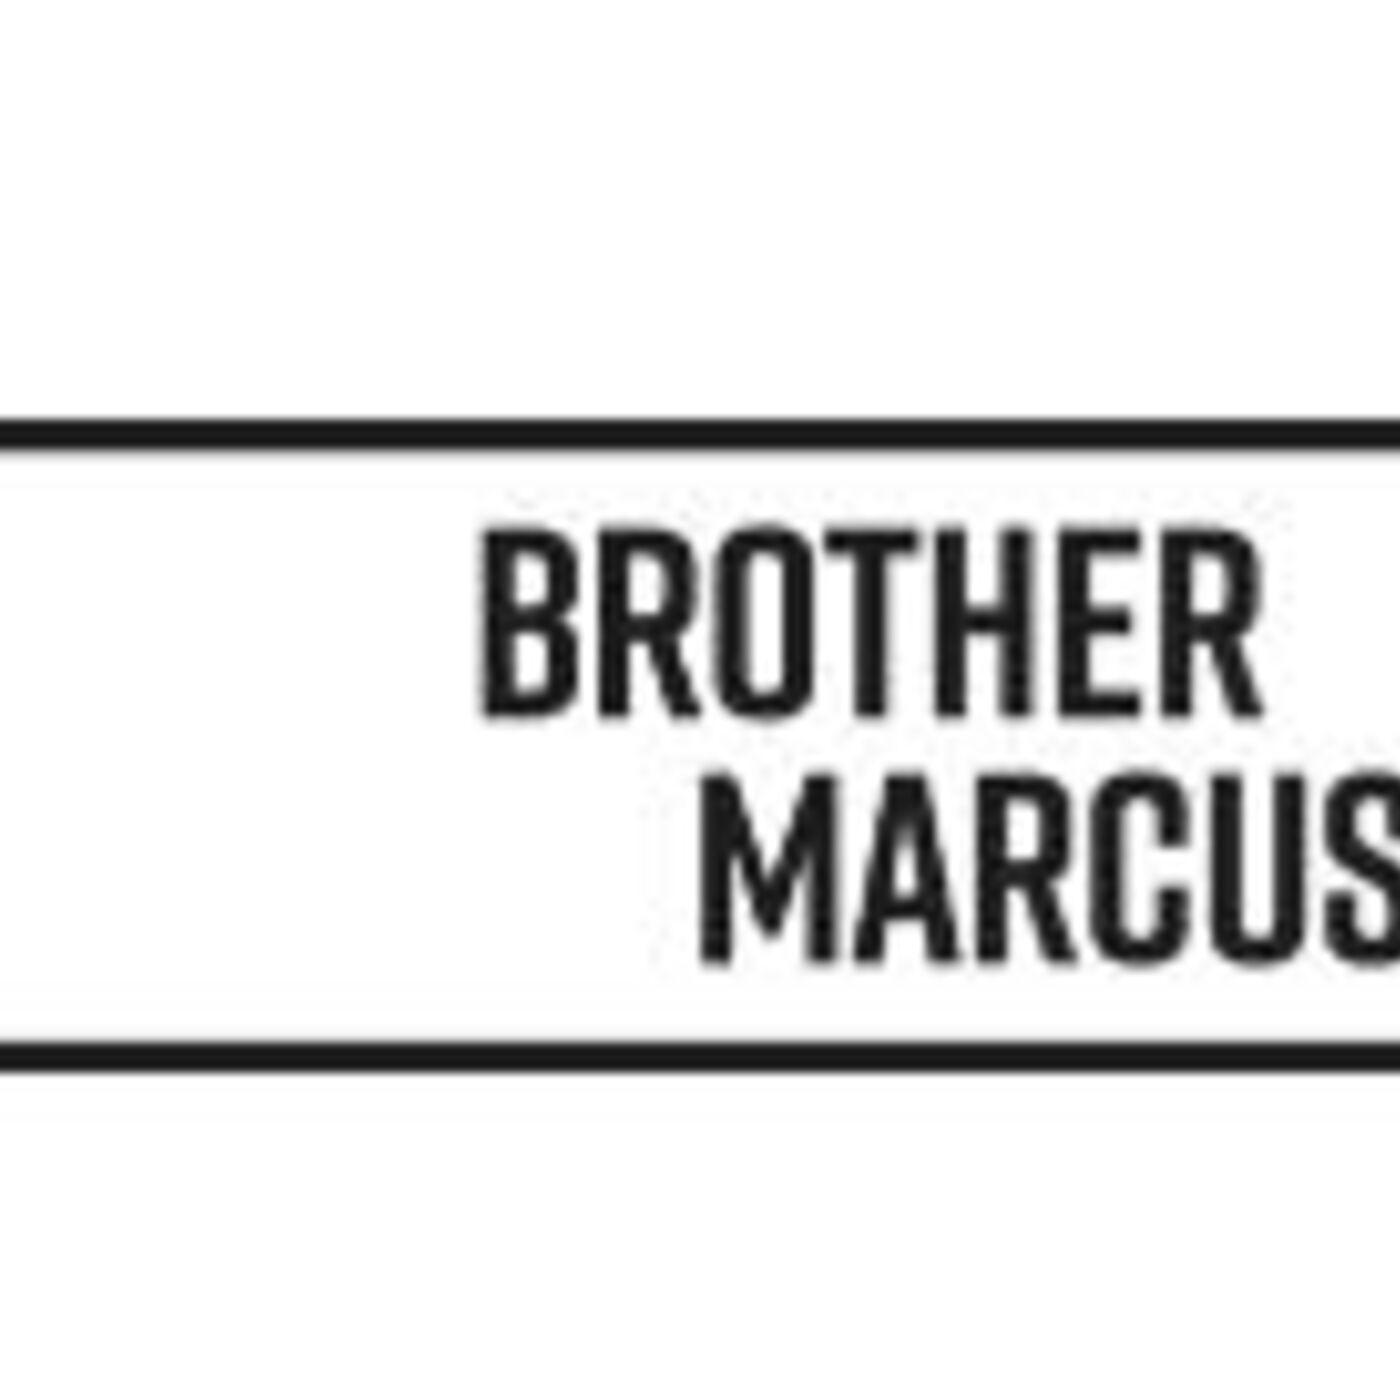 9. O Brother Marcus, Where Art Thou?